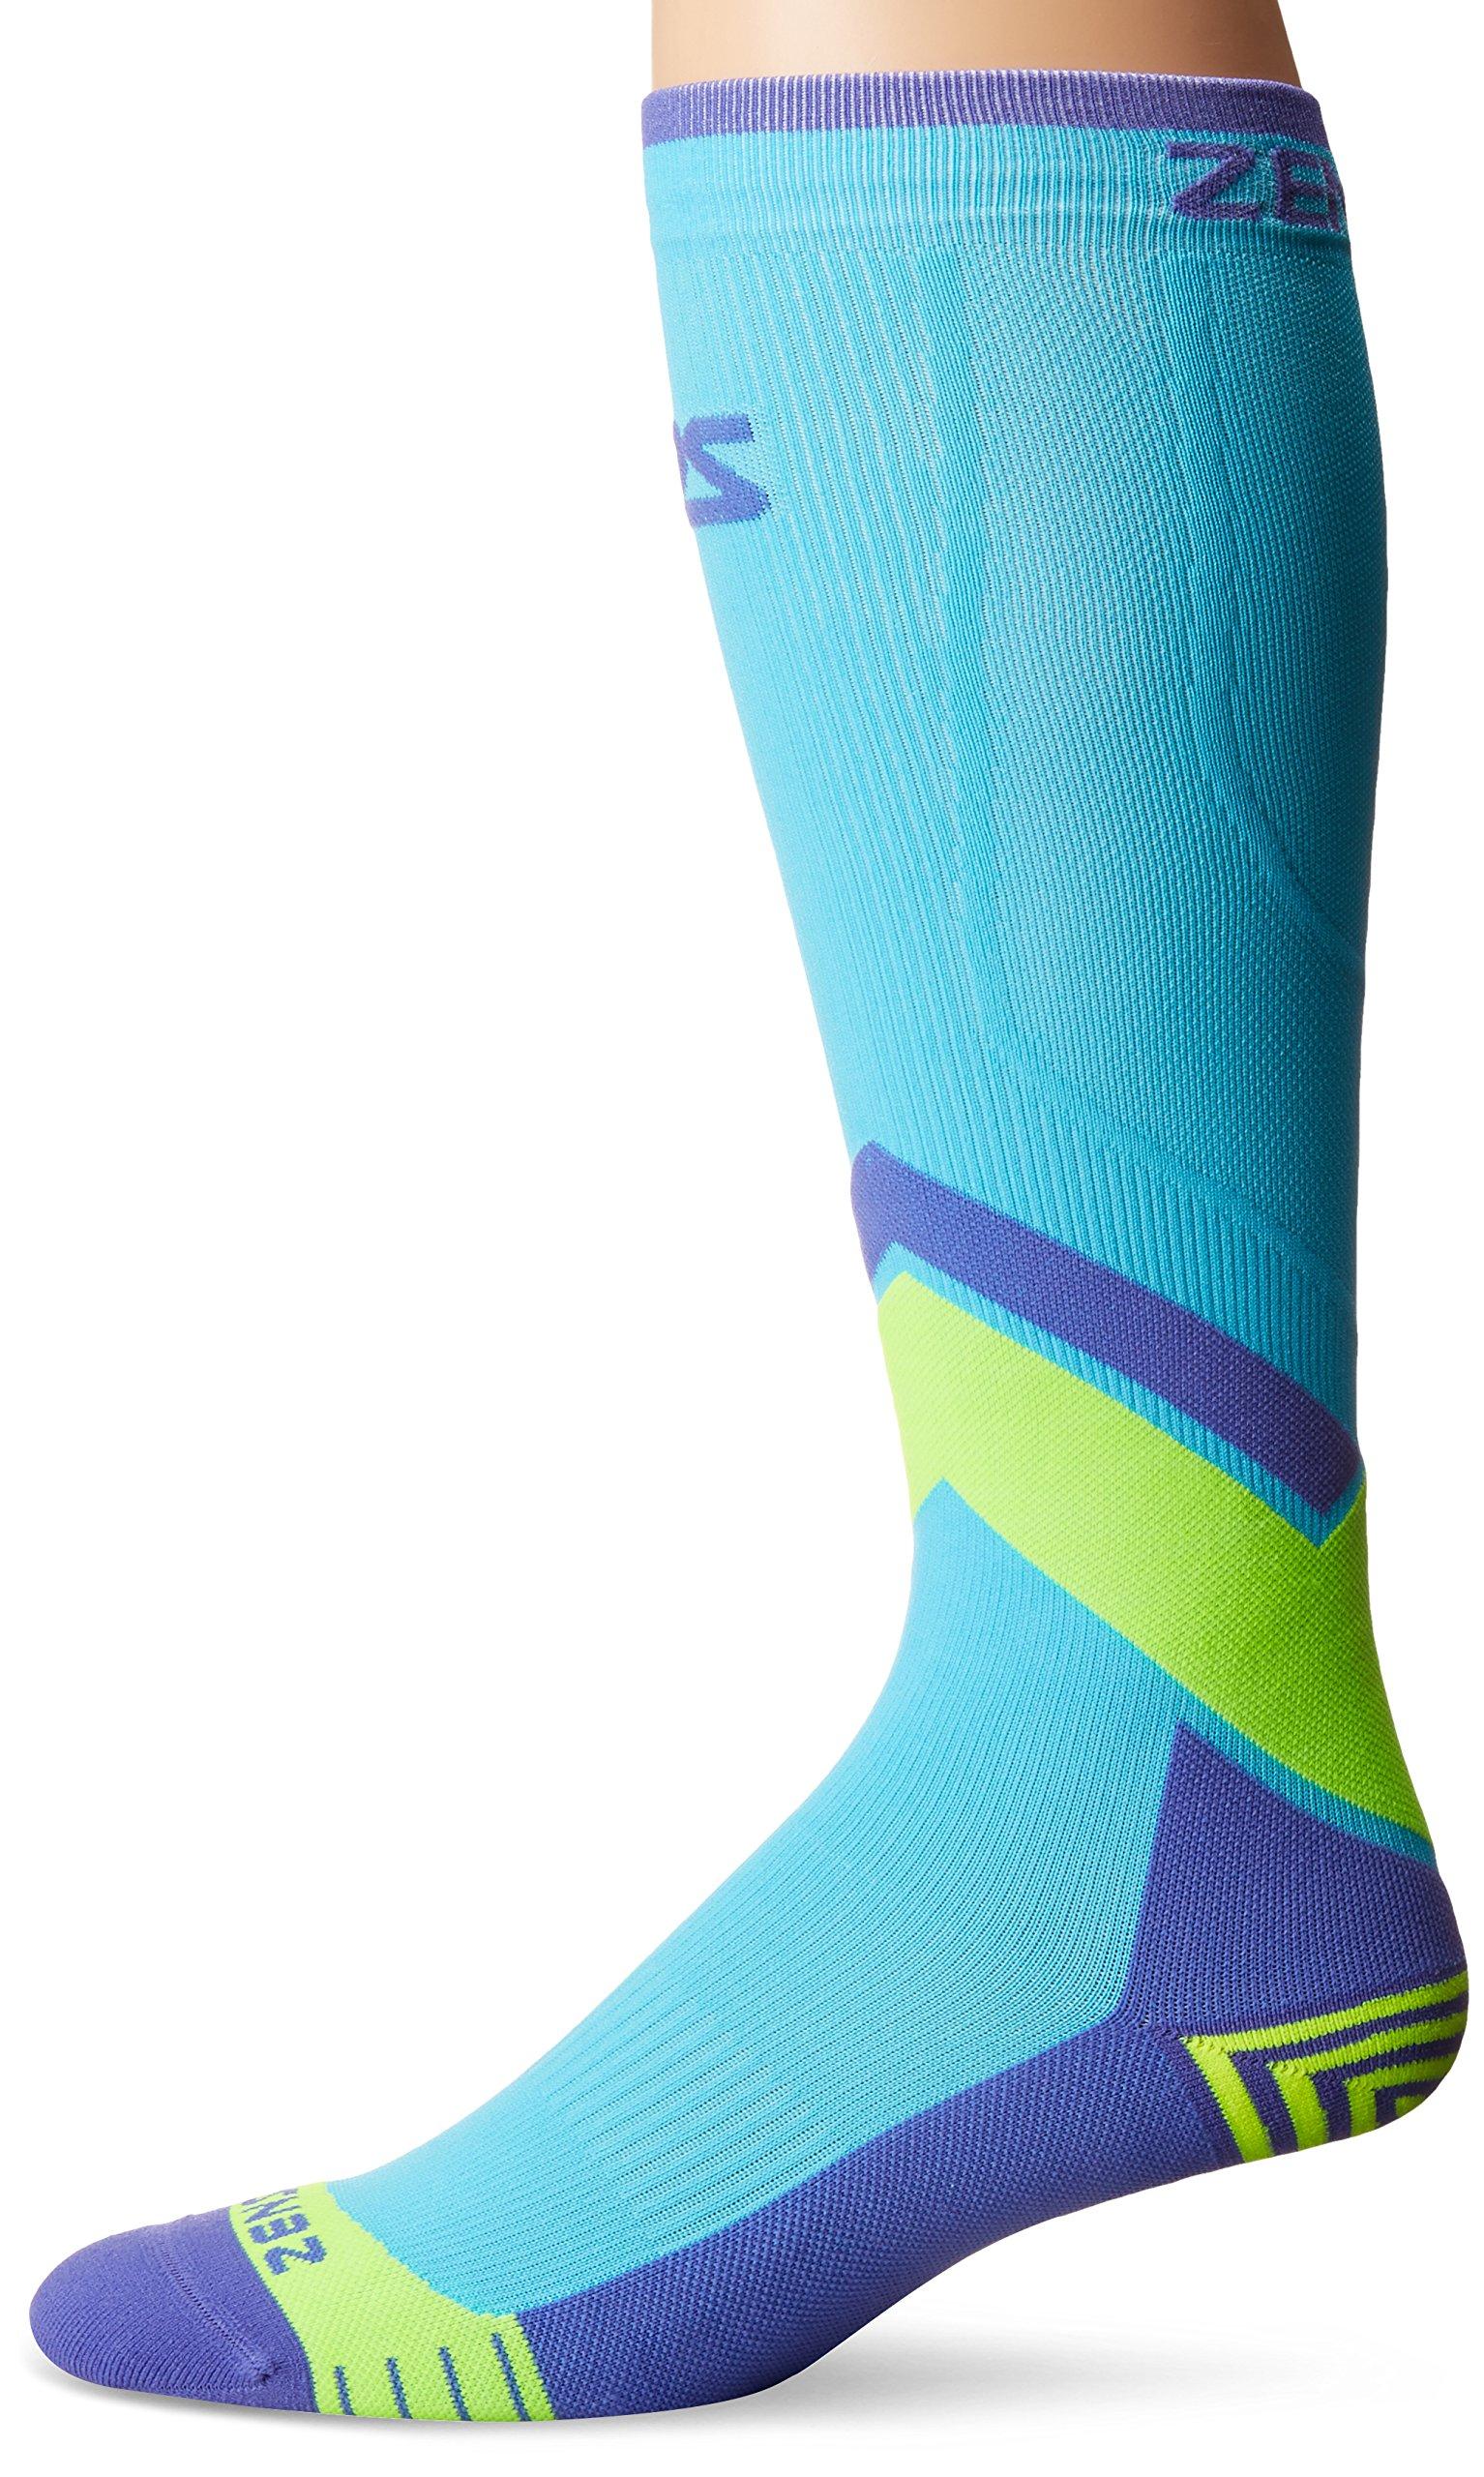 Zensah Pop Tech+ Compression Graduated Compression Socks, Aqua/Yellow/Purple, Small